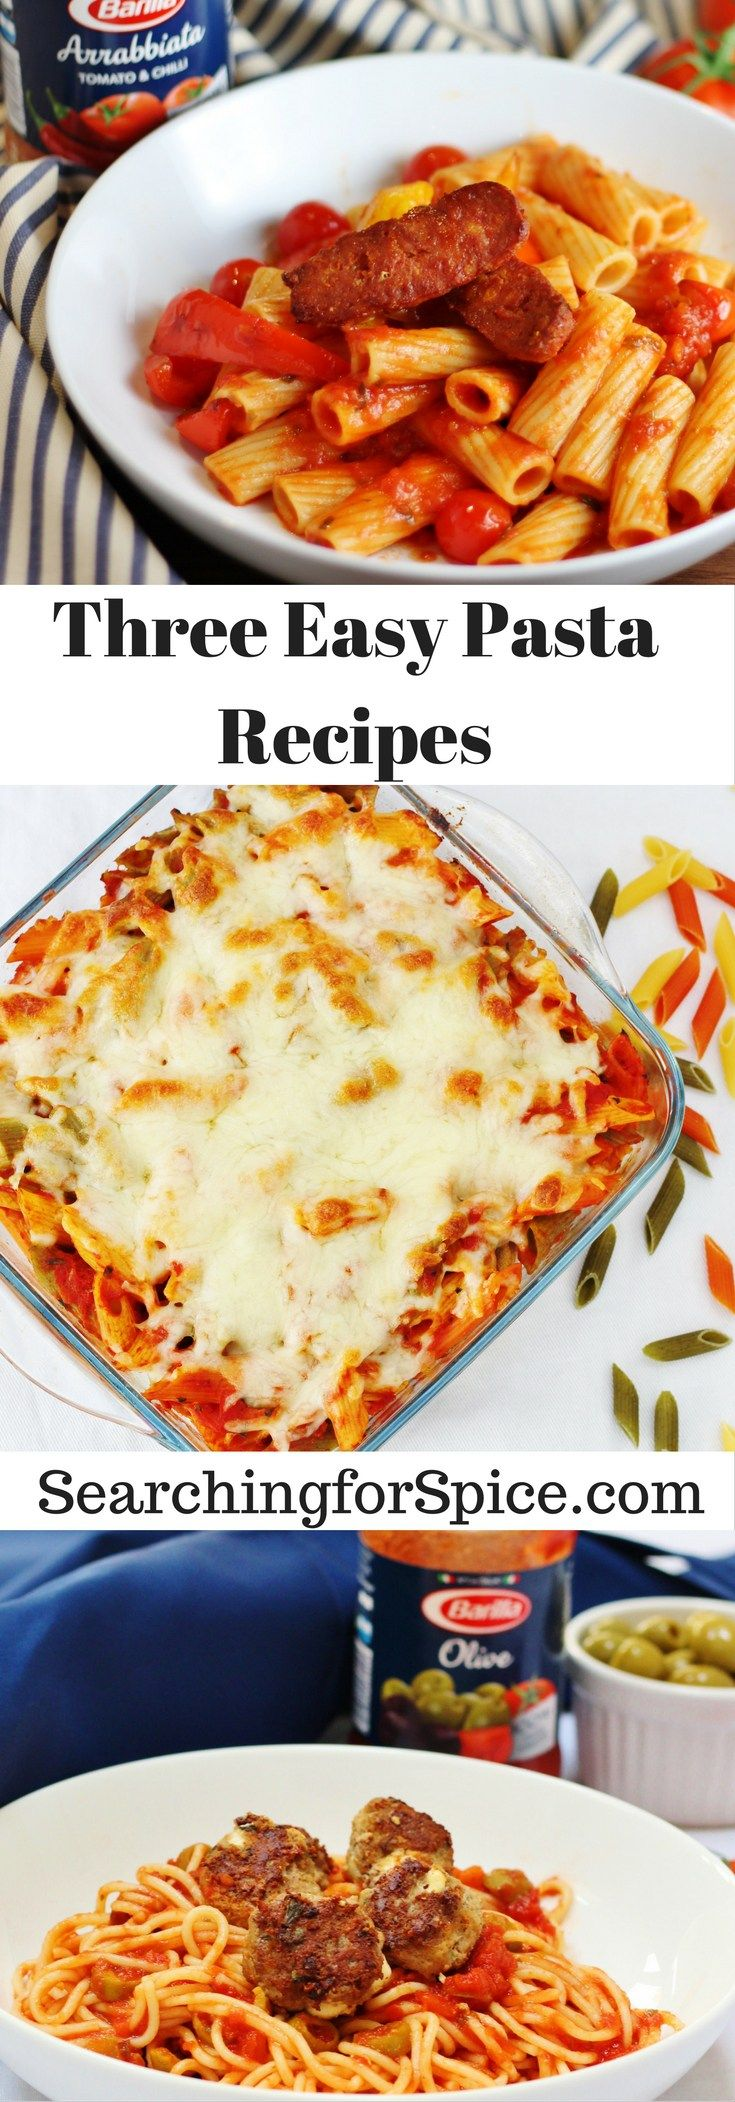 Three easy pasta recipes with Barilla pasta and sauces